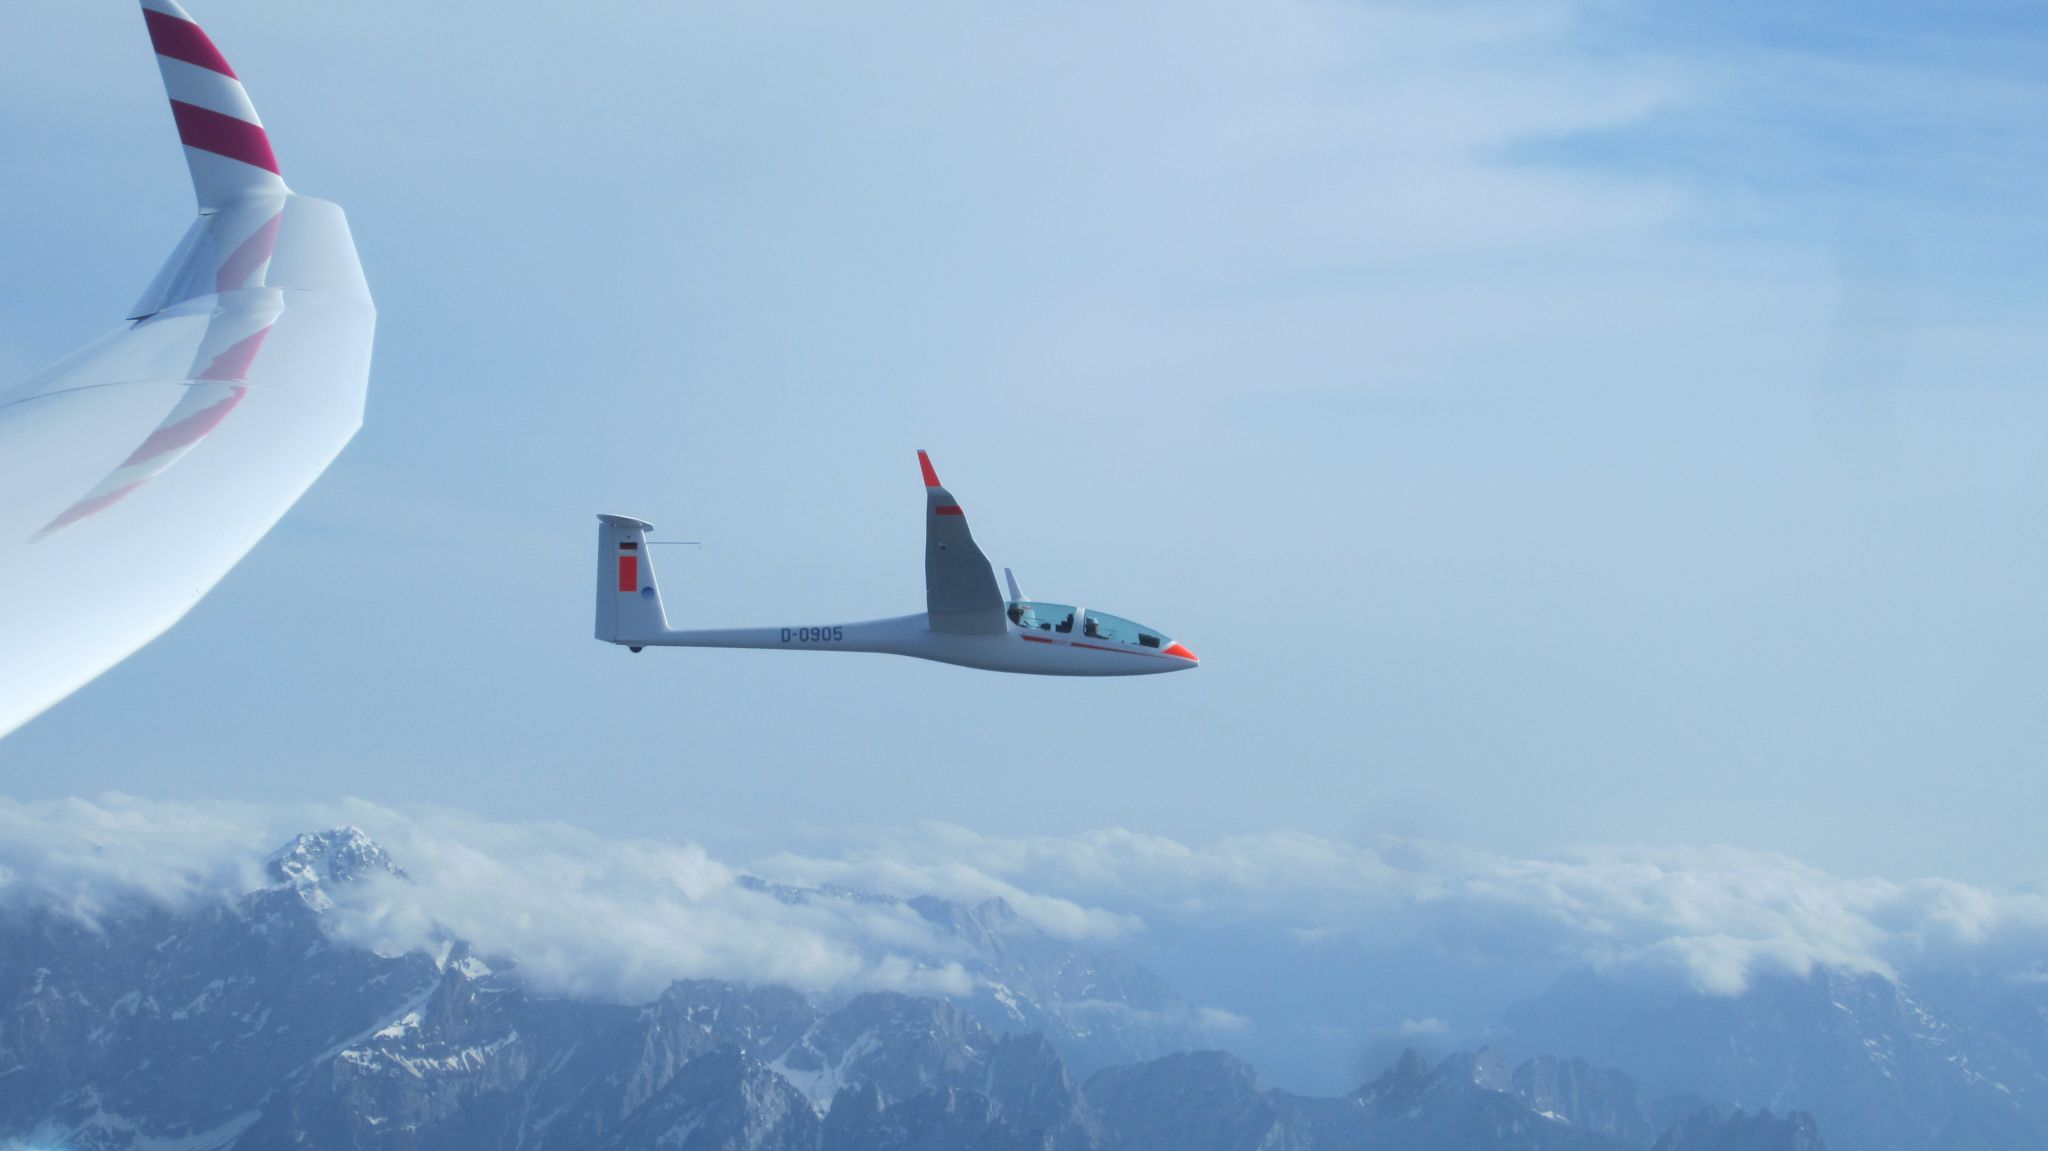 DG 1001 über den Alpen